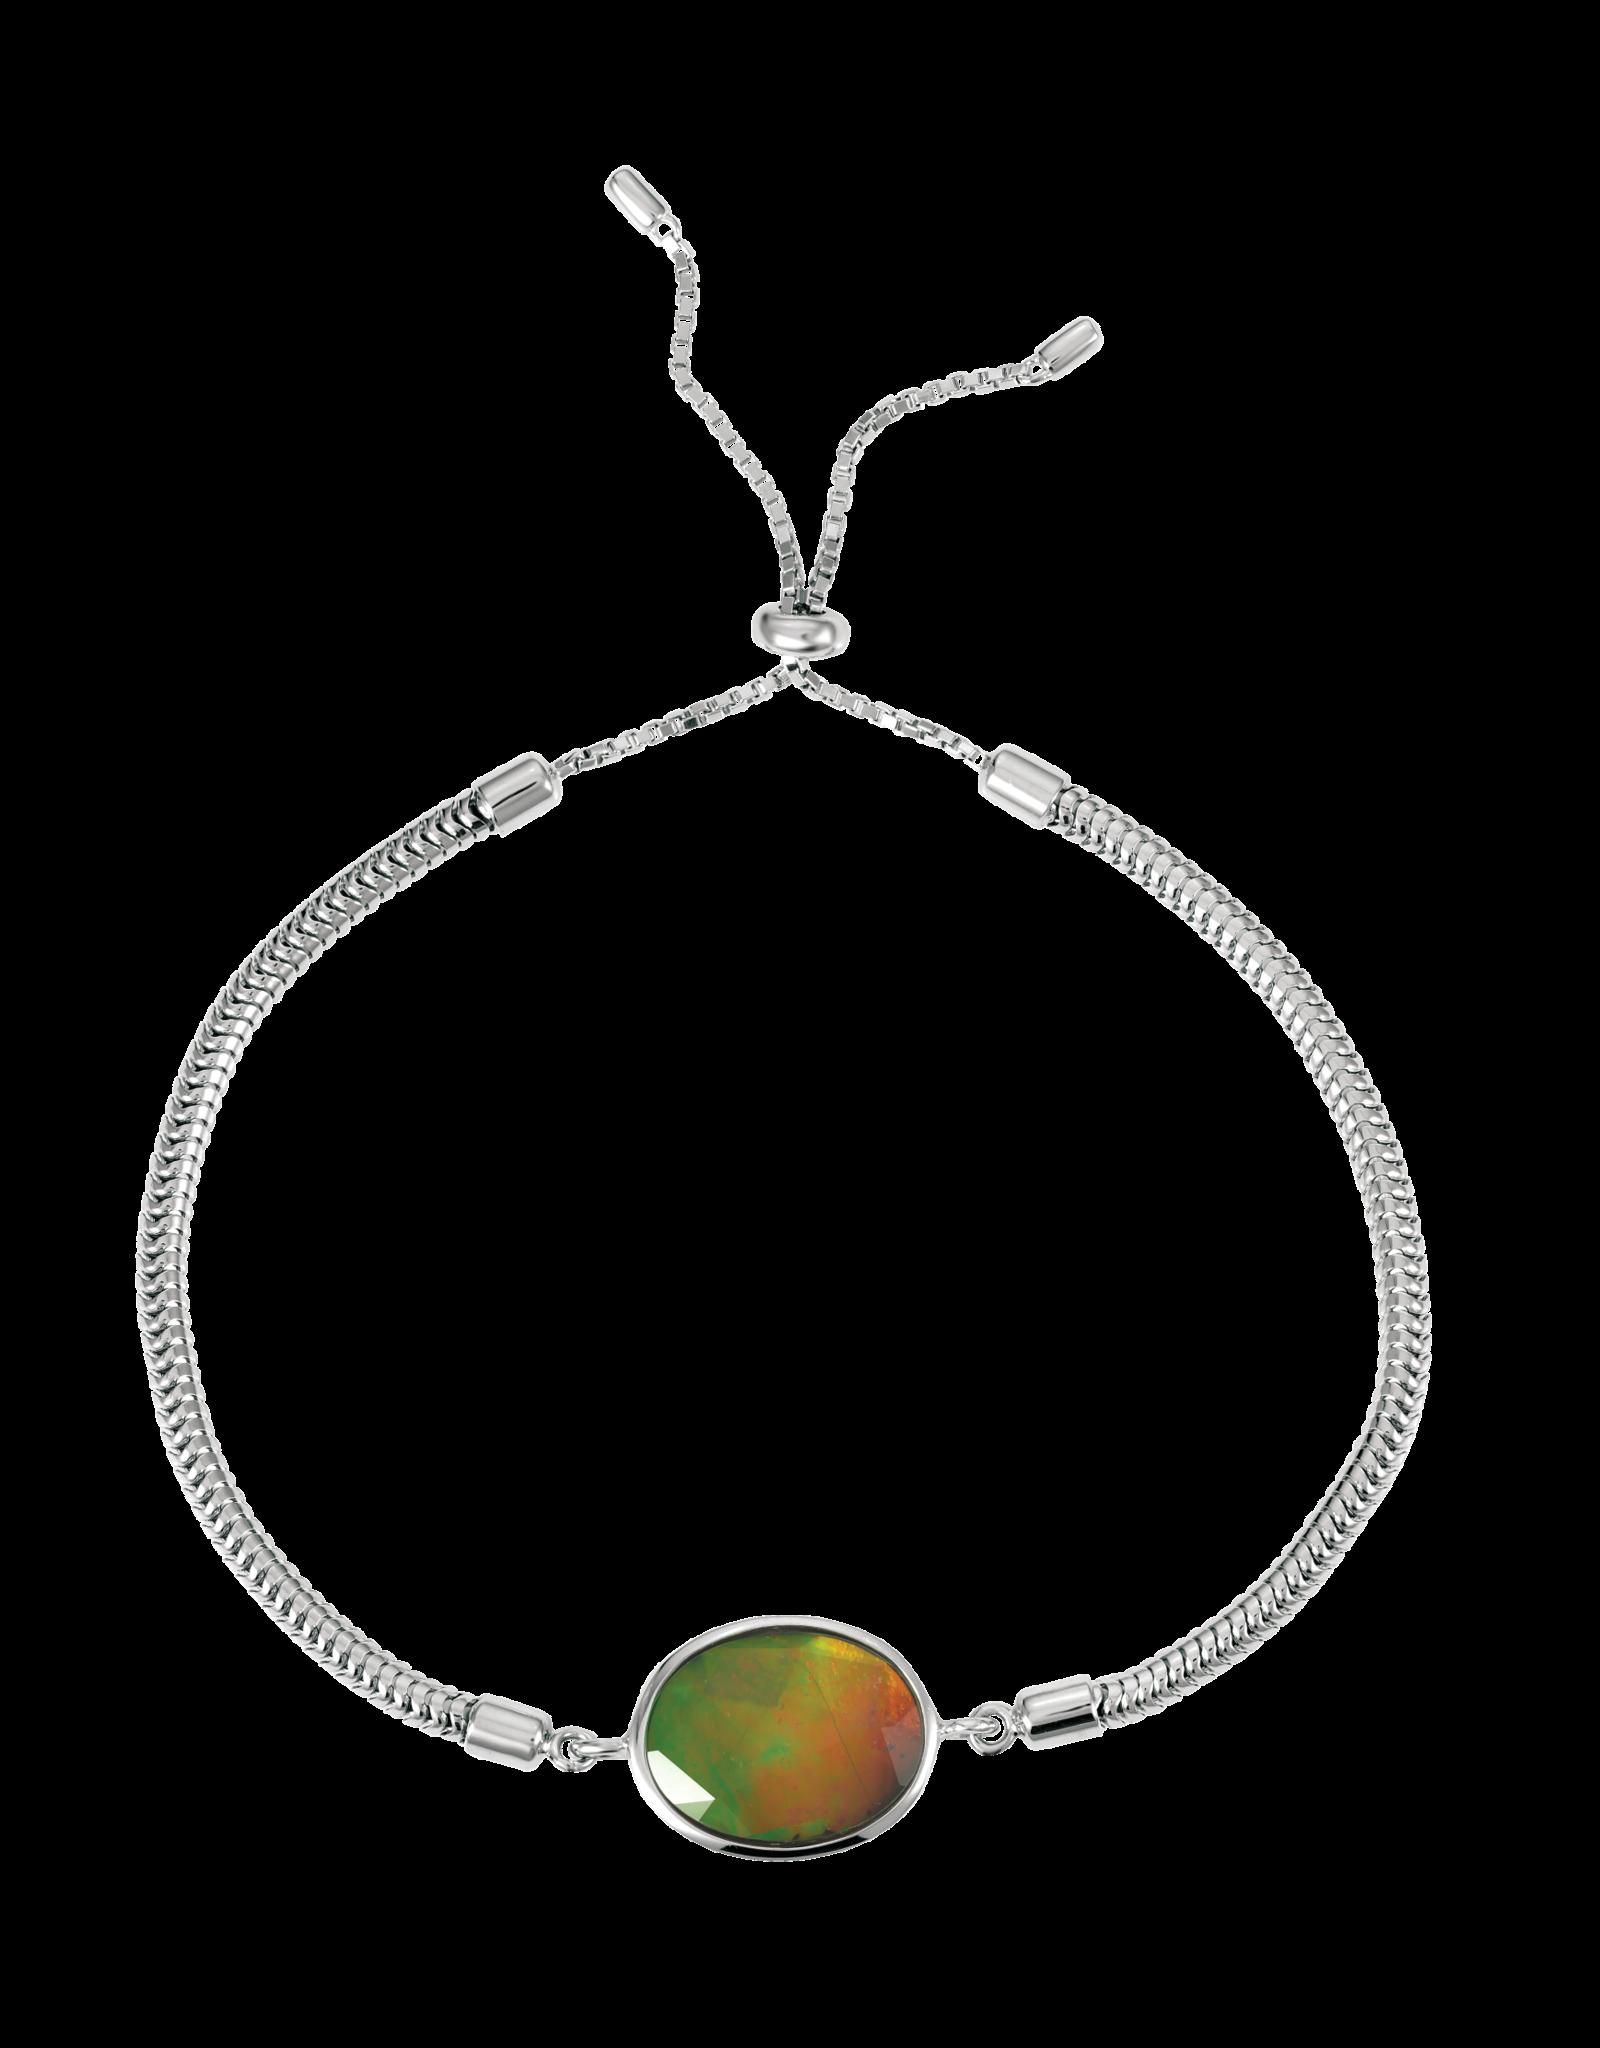 Aria Bracelet - SBR338F